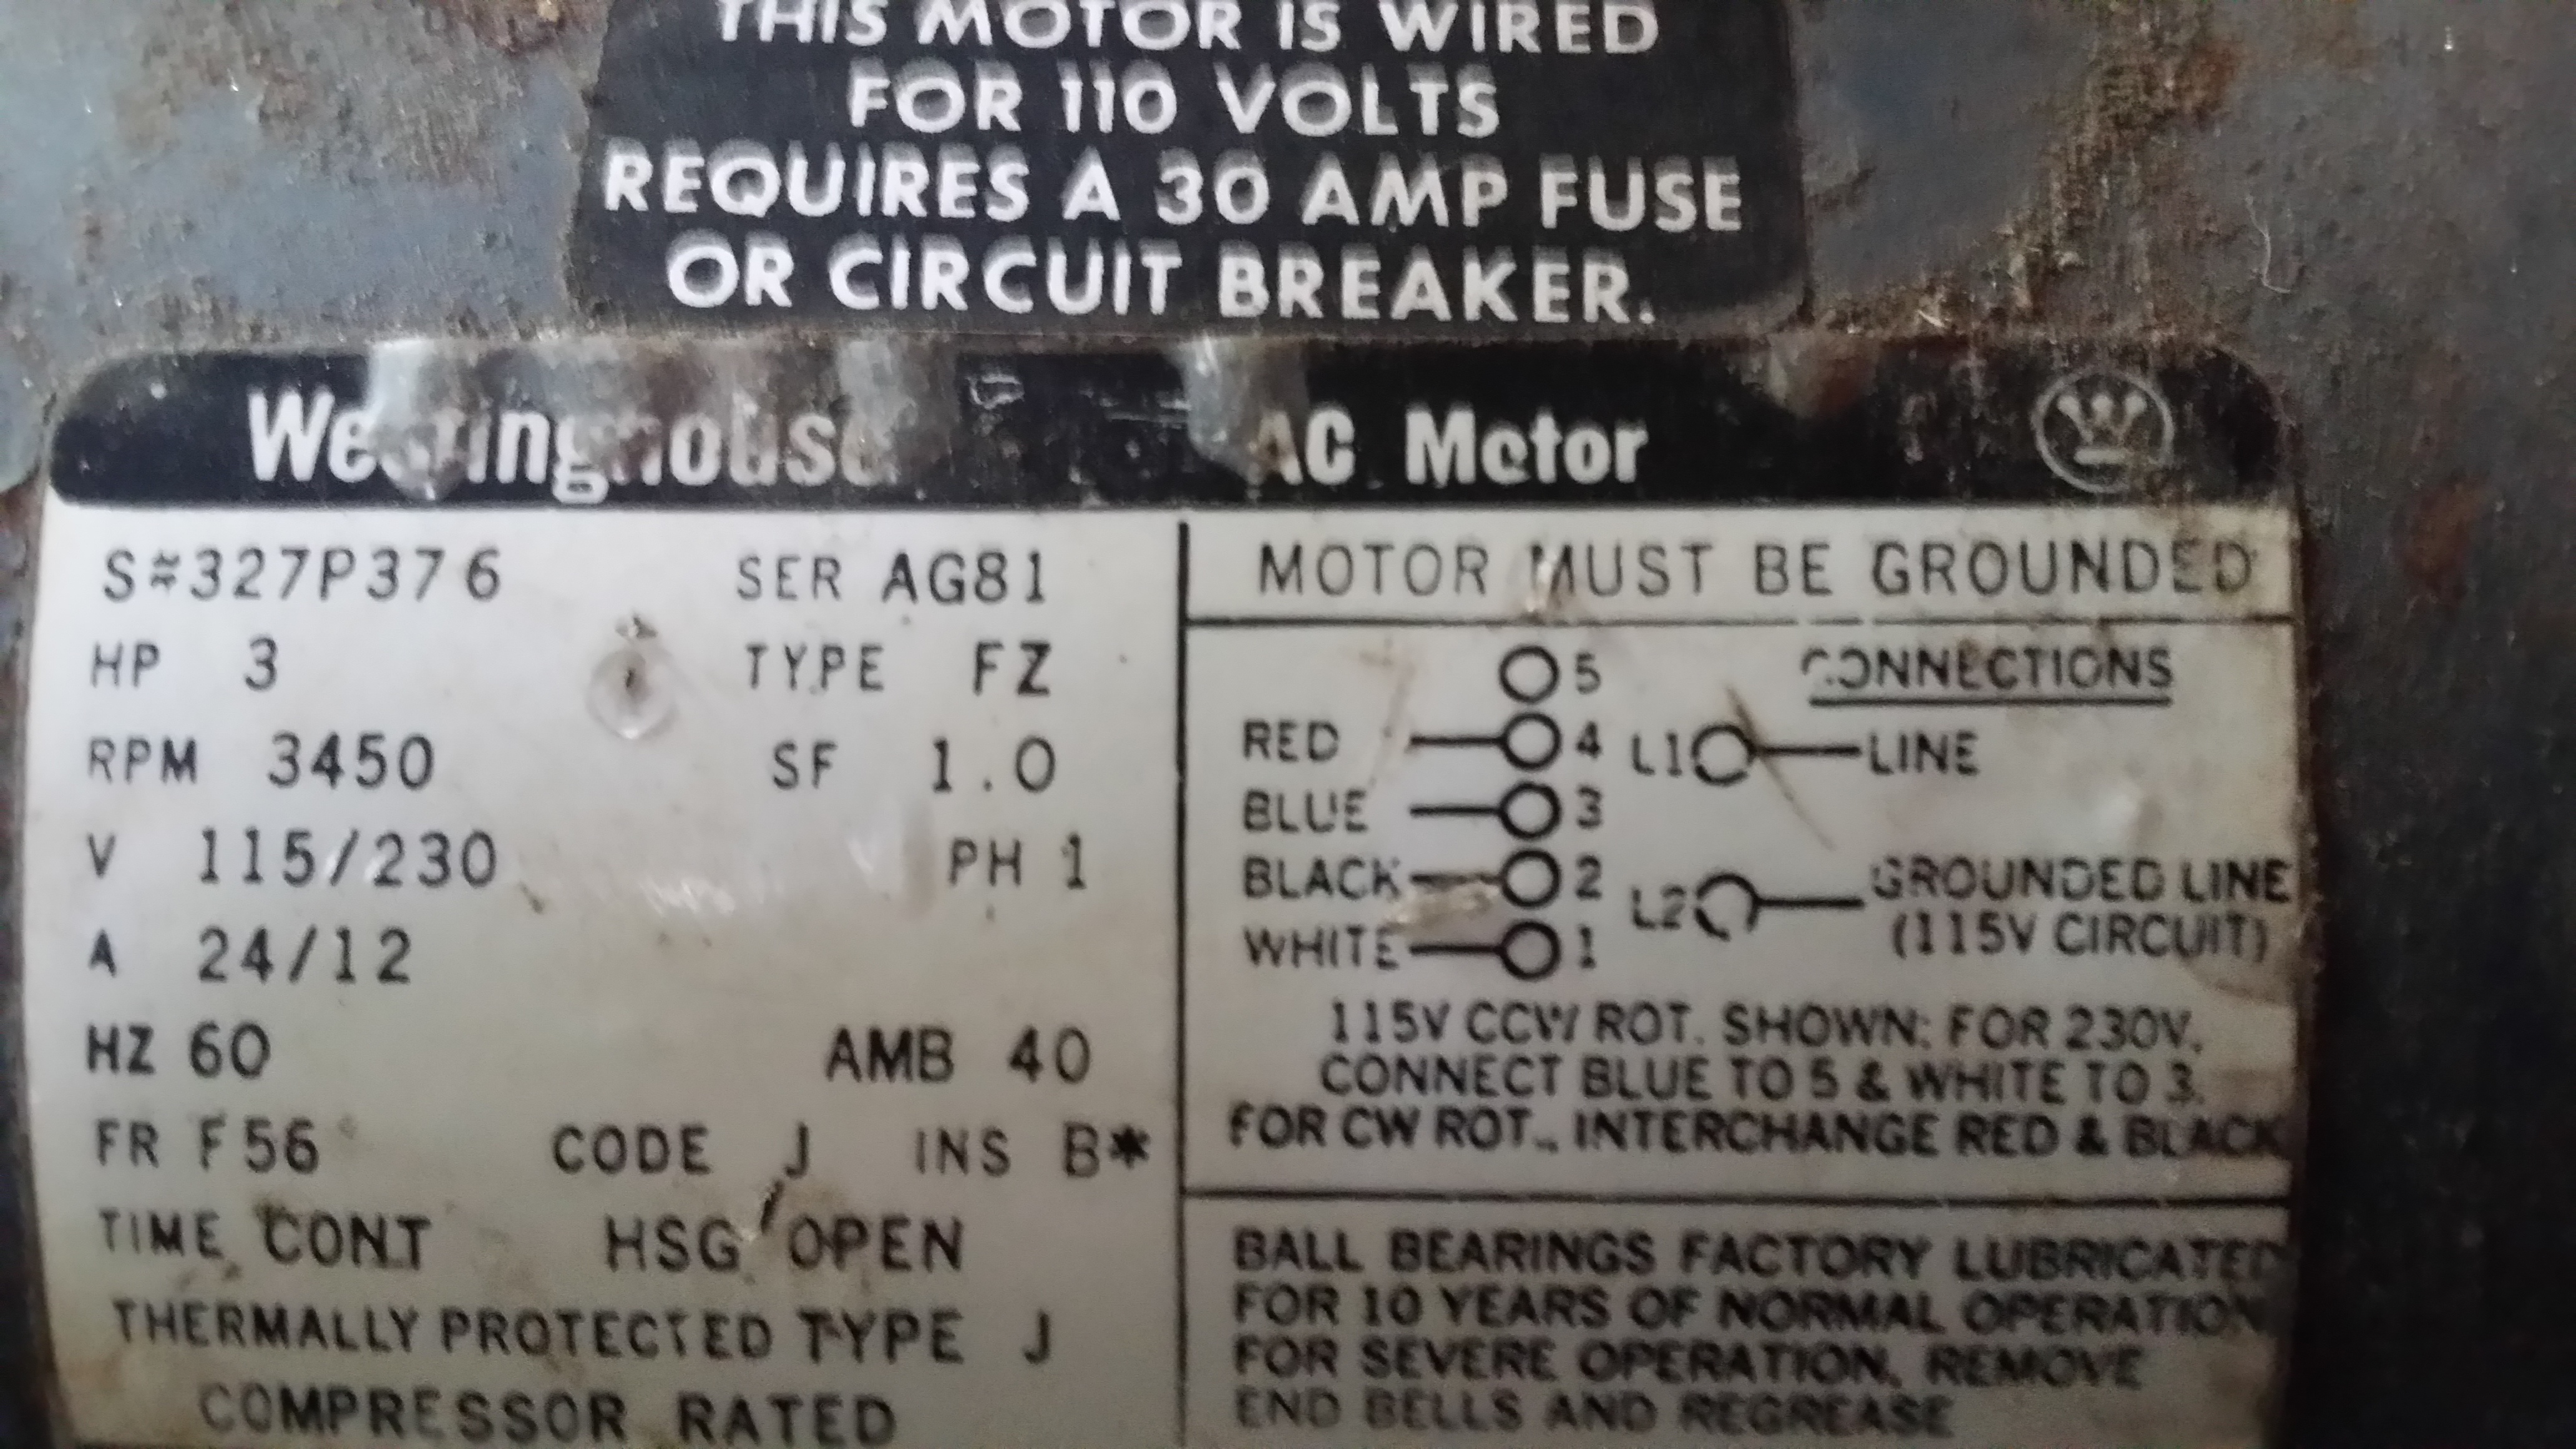 I Have A 3hp Westinghouse Electrical Motor On Sanborn Air Dayton Wiring Diagram 5k960b Joemotor1